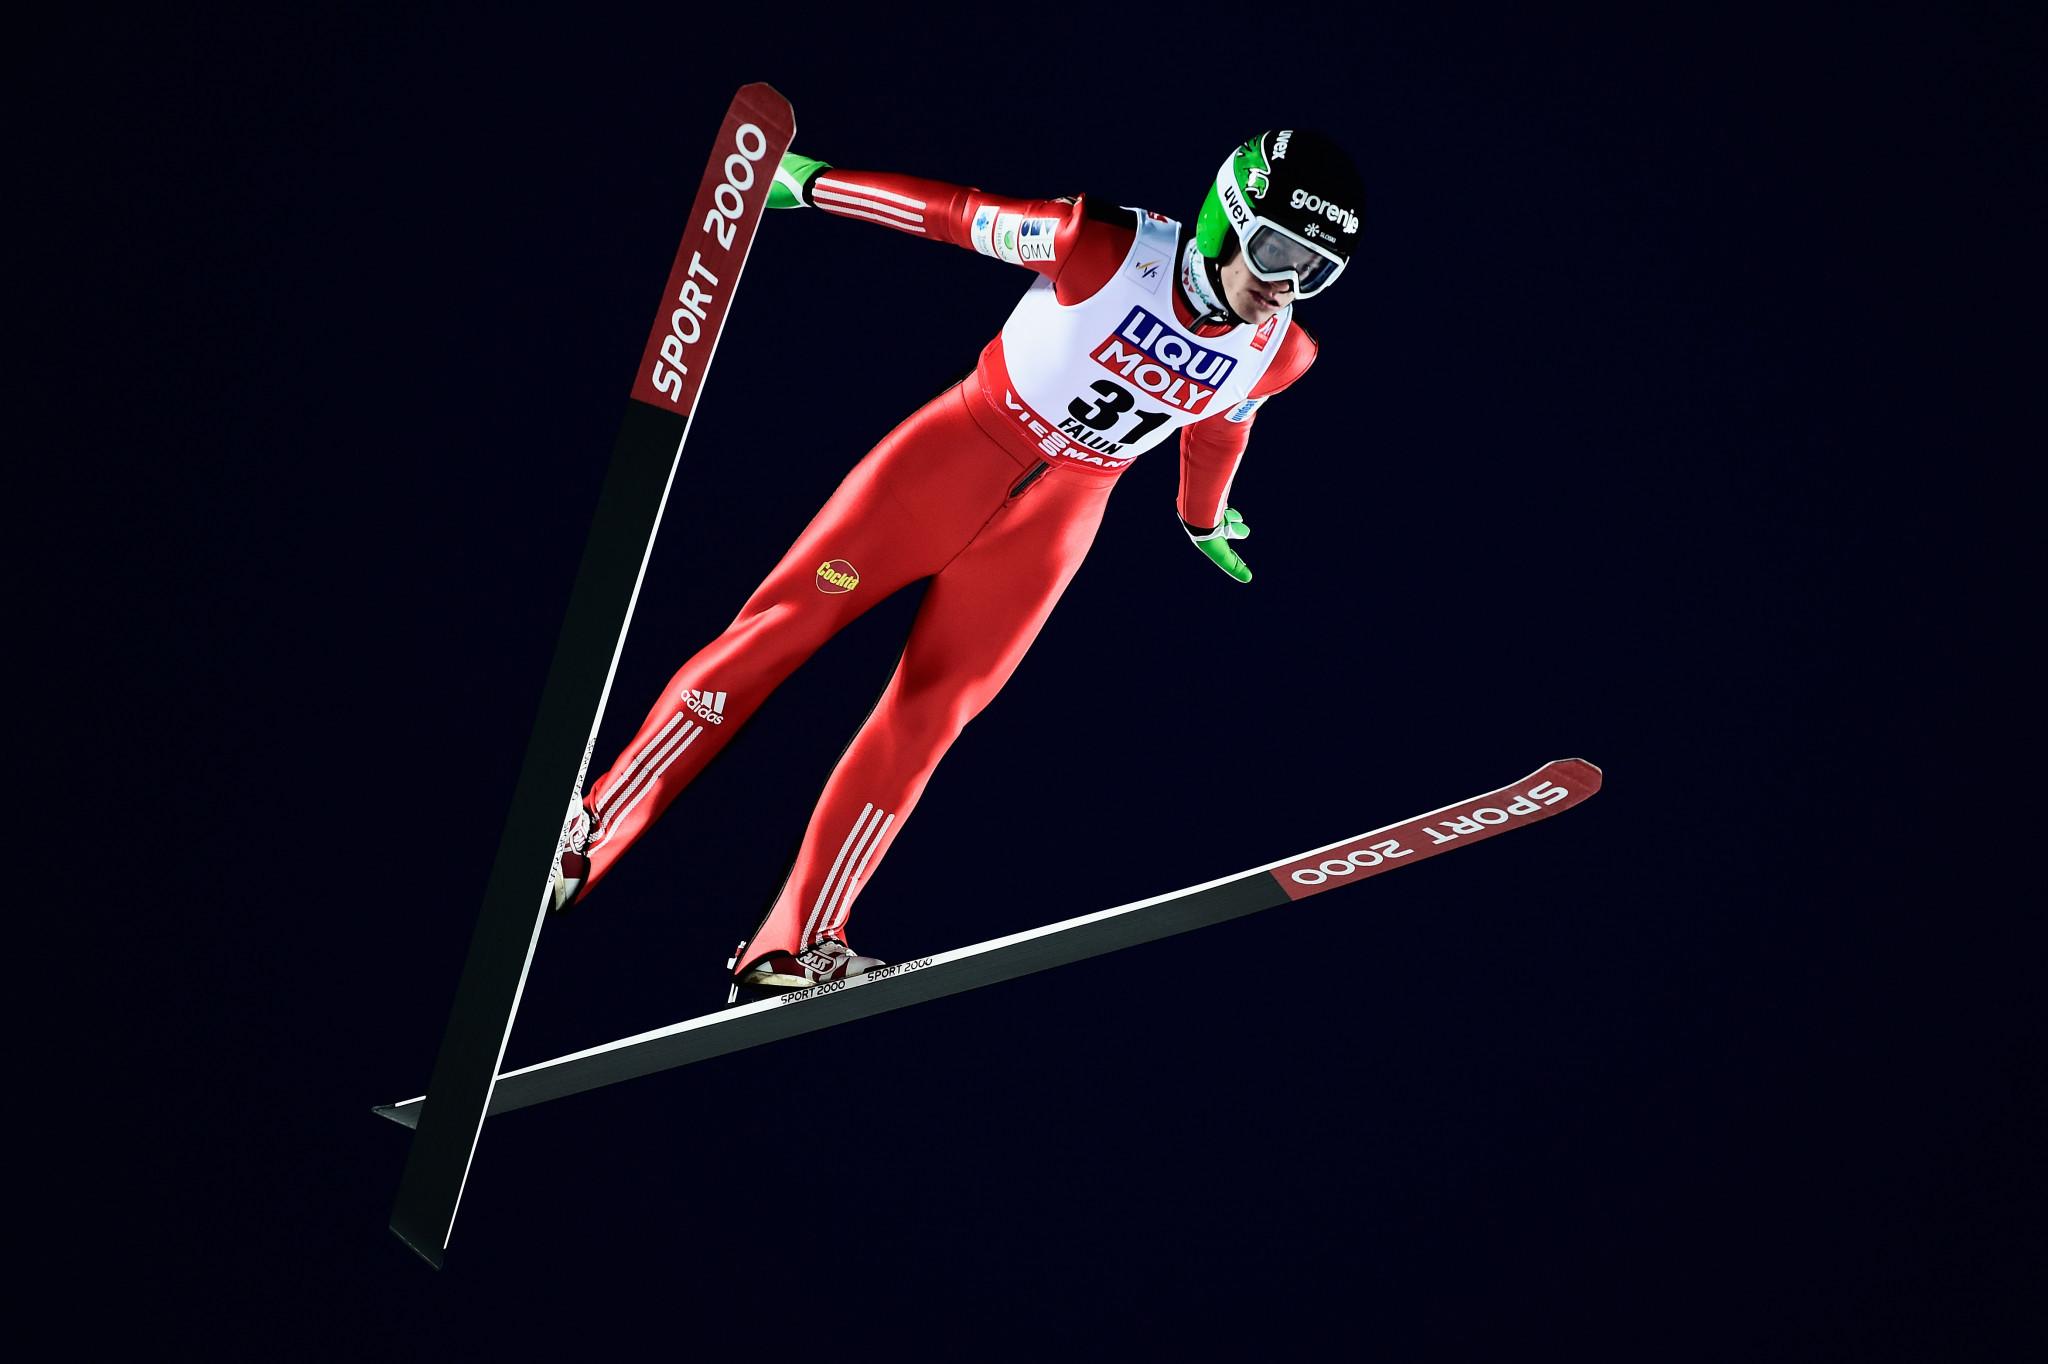 Ski jumper Pungertar announces retirement